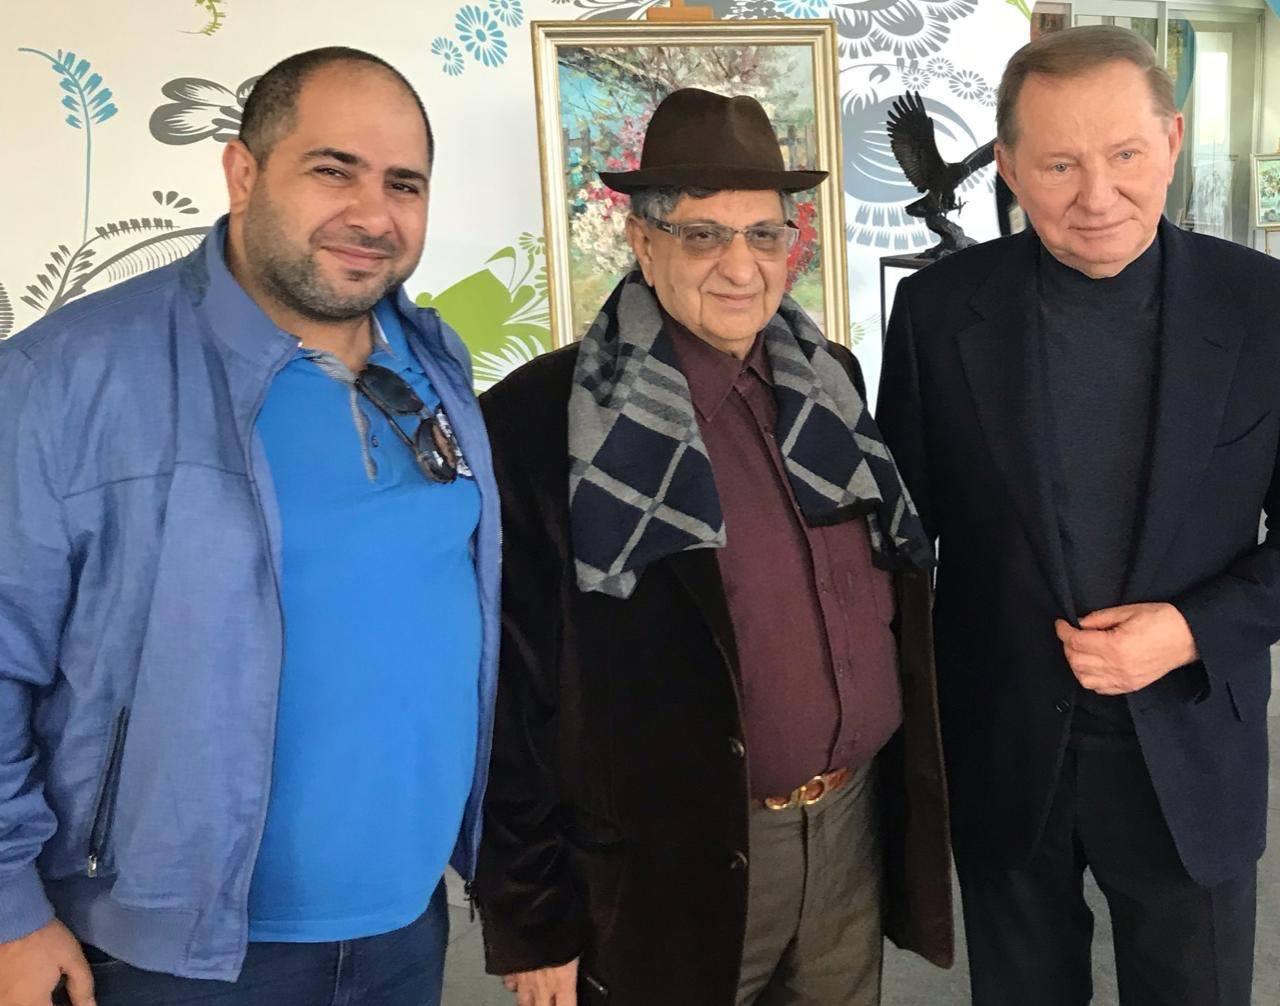 Naum Koen Наум Коэн Наум Коен with Cyrus S. Poonawalla & Leonid Kuchma in Ukraine